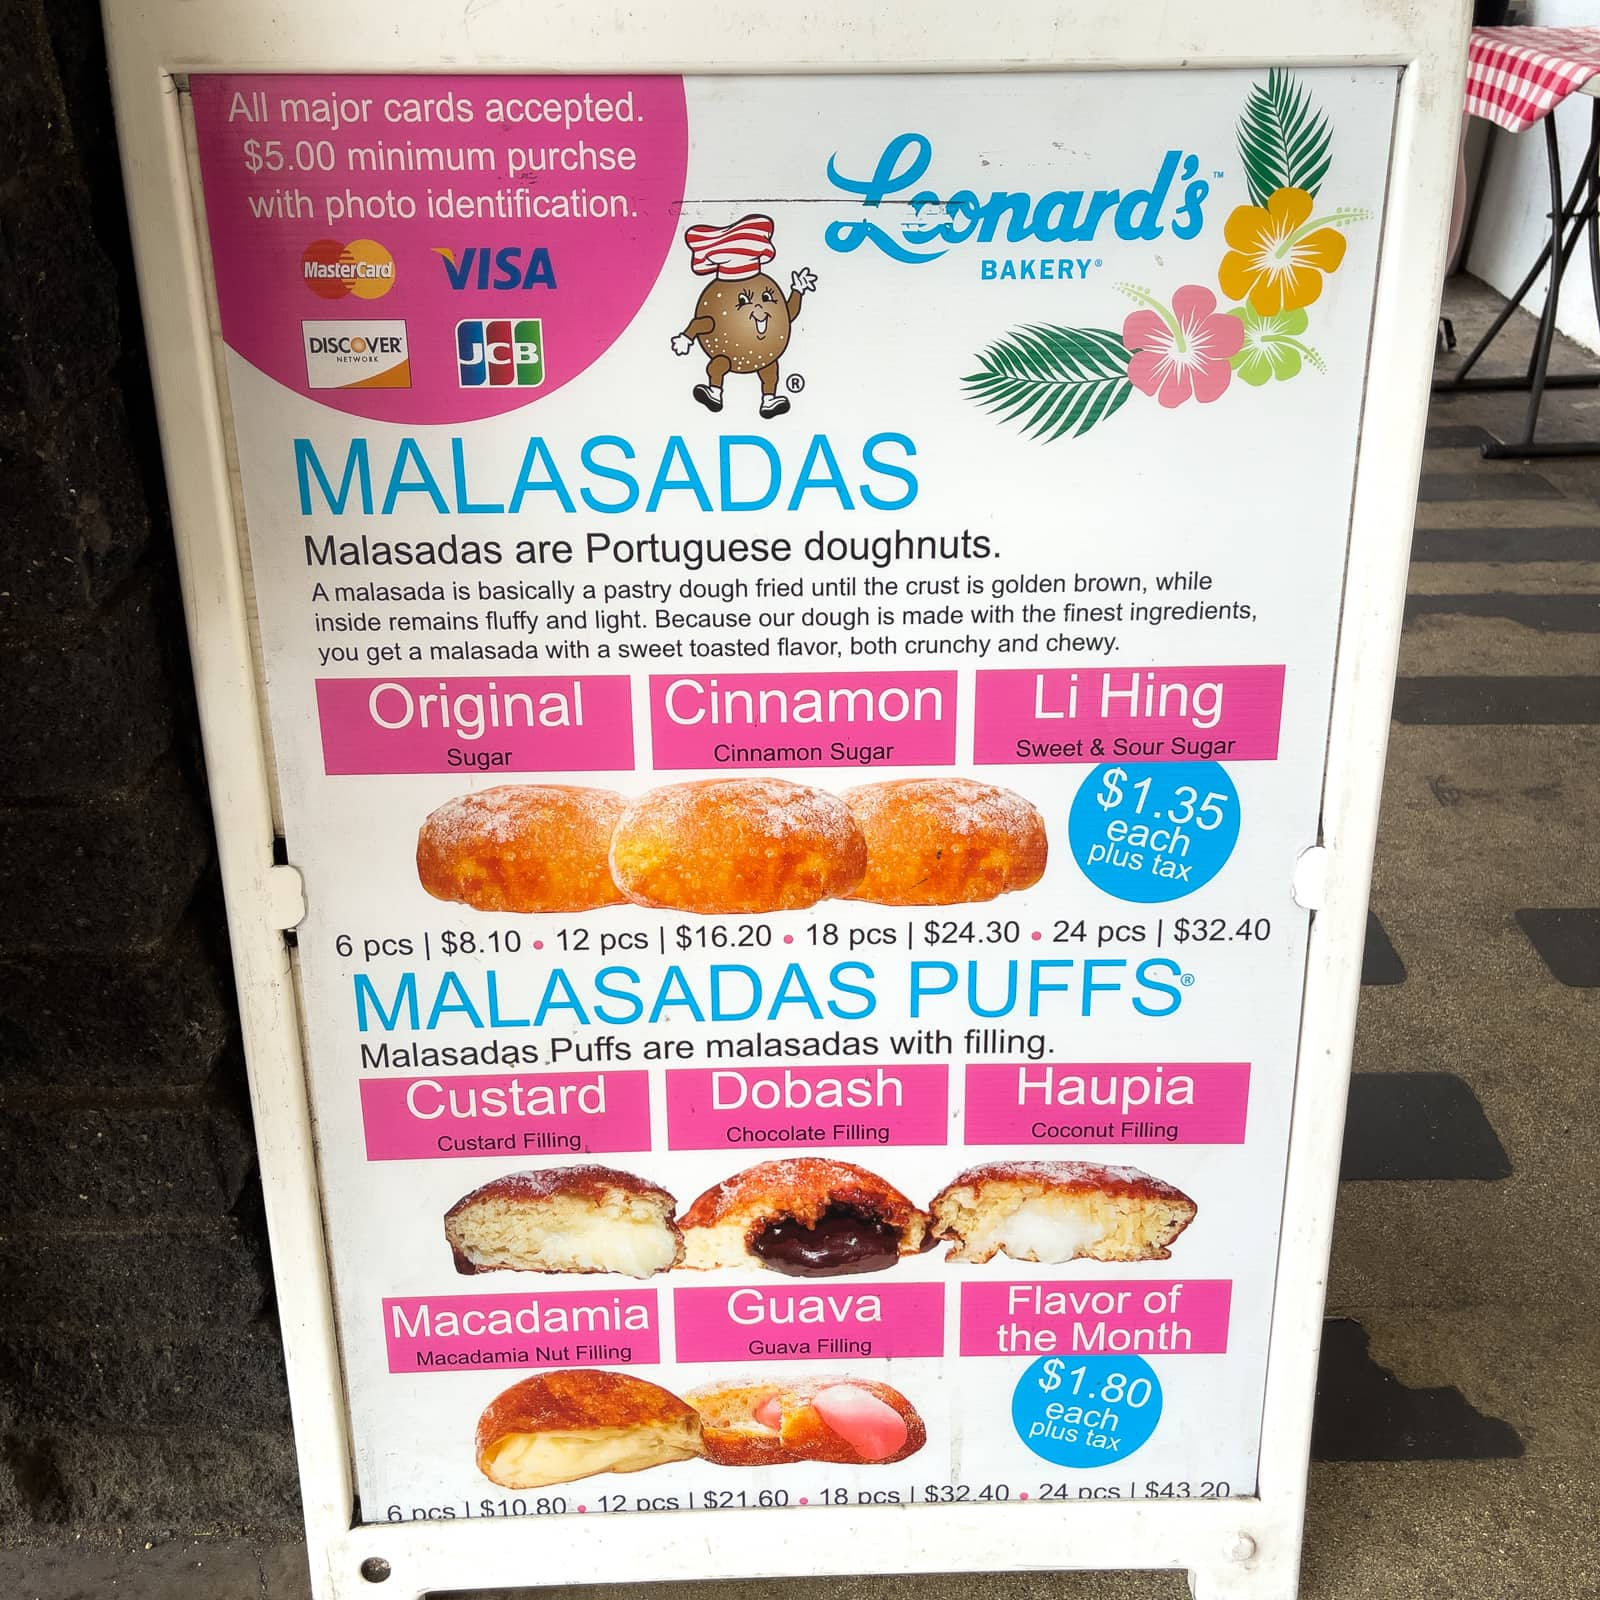 The malasada menu at Leonard's